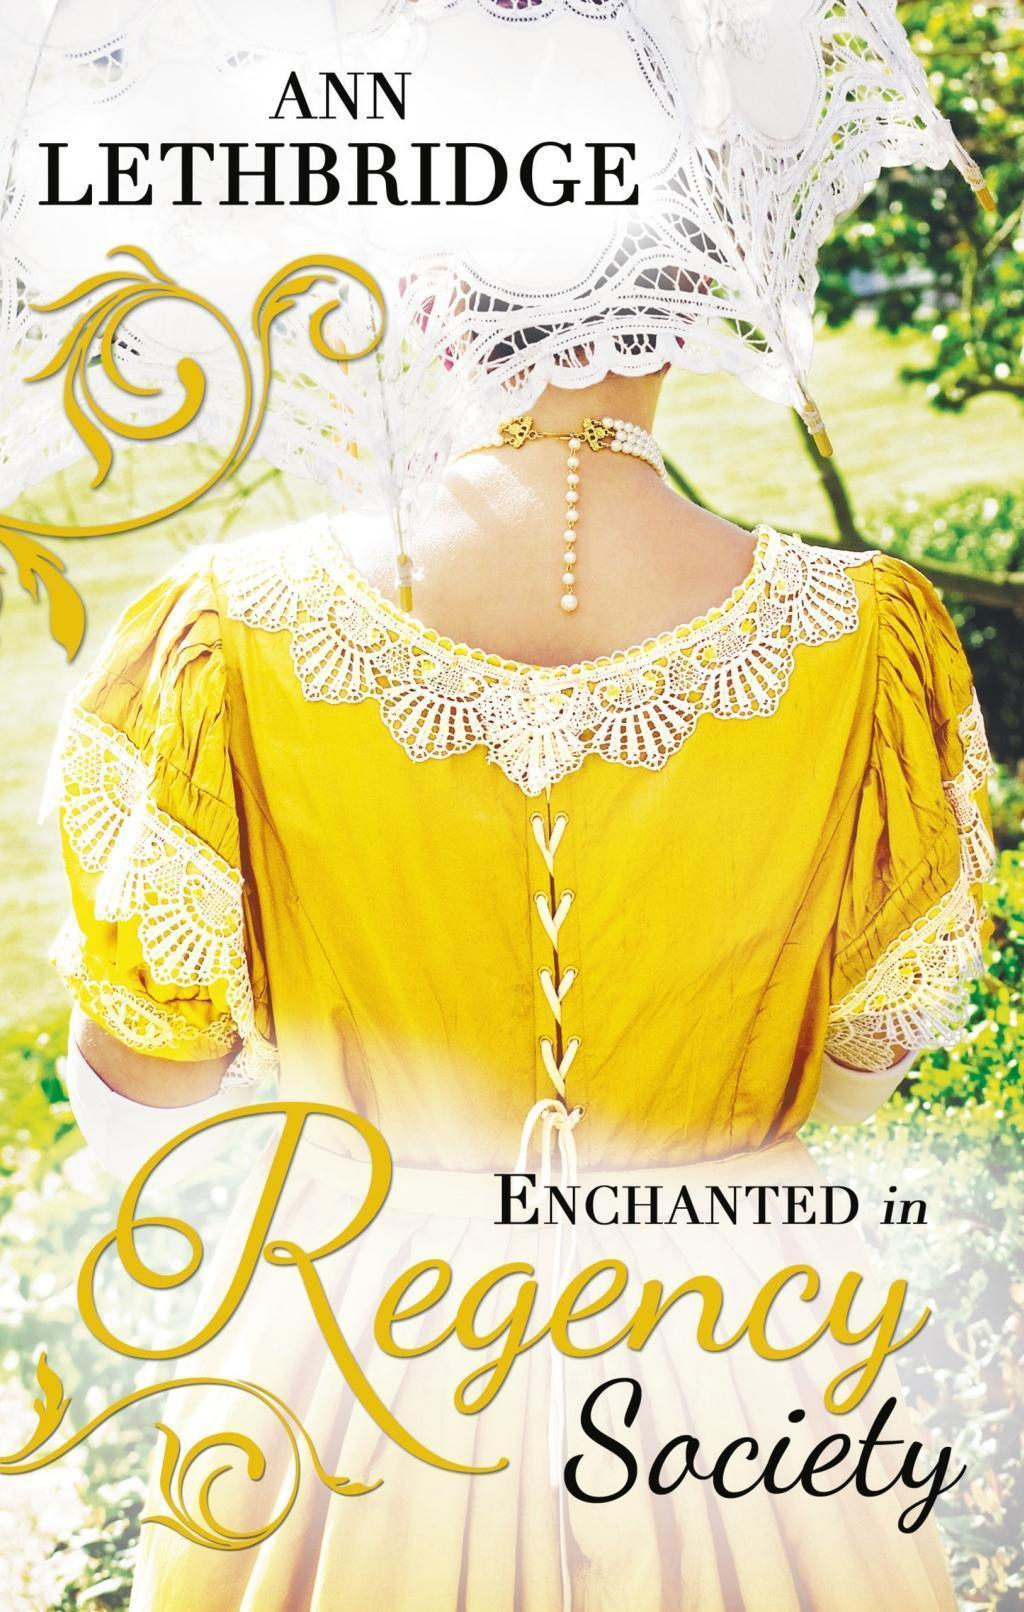 Enchanted in Regency Society: Wicked Rake, Defiant Mistress / The Gamekeeper's Lady (Mills & Boon M&B)